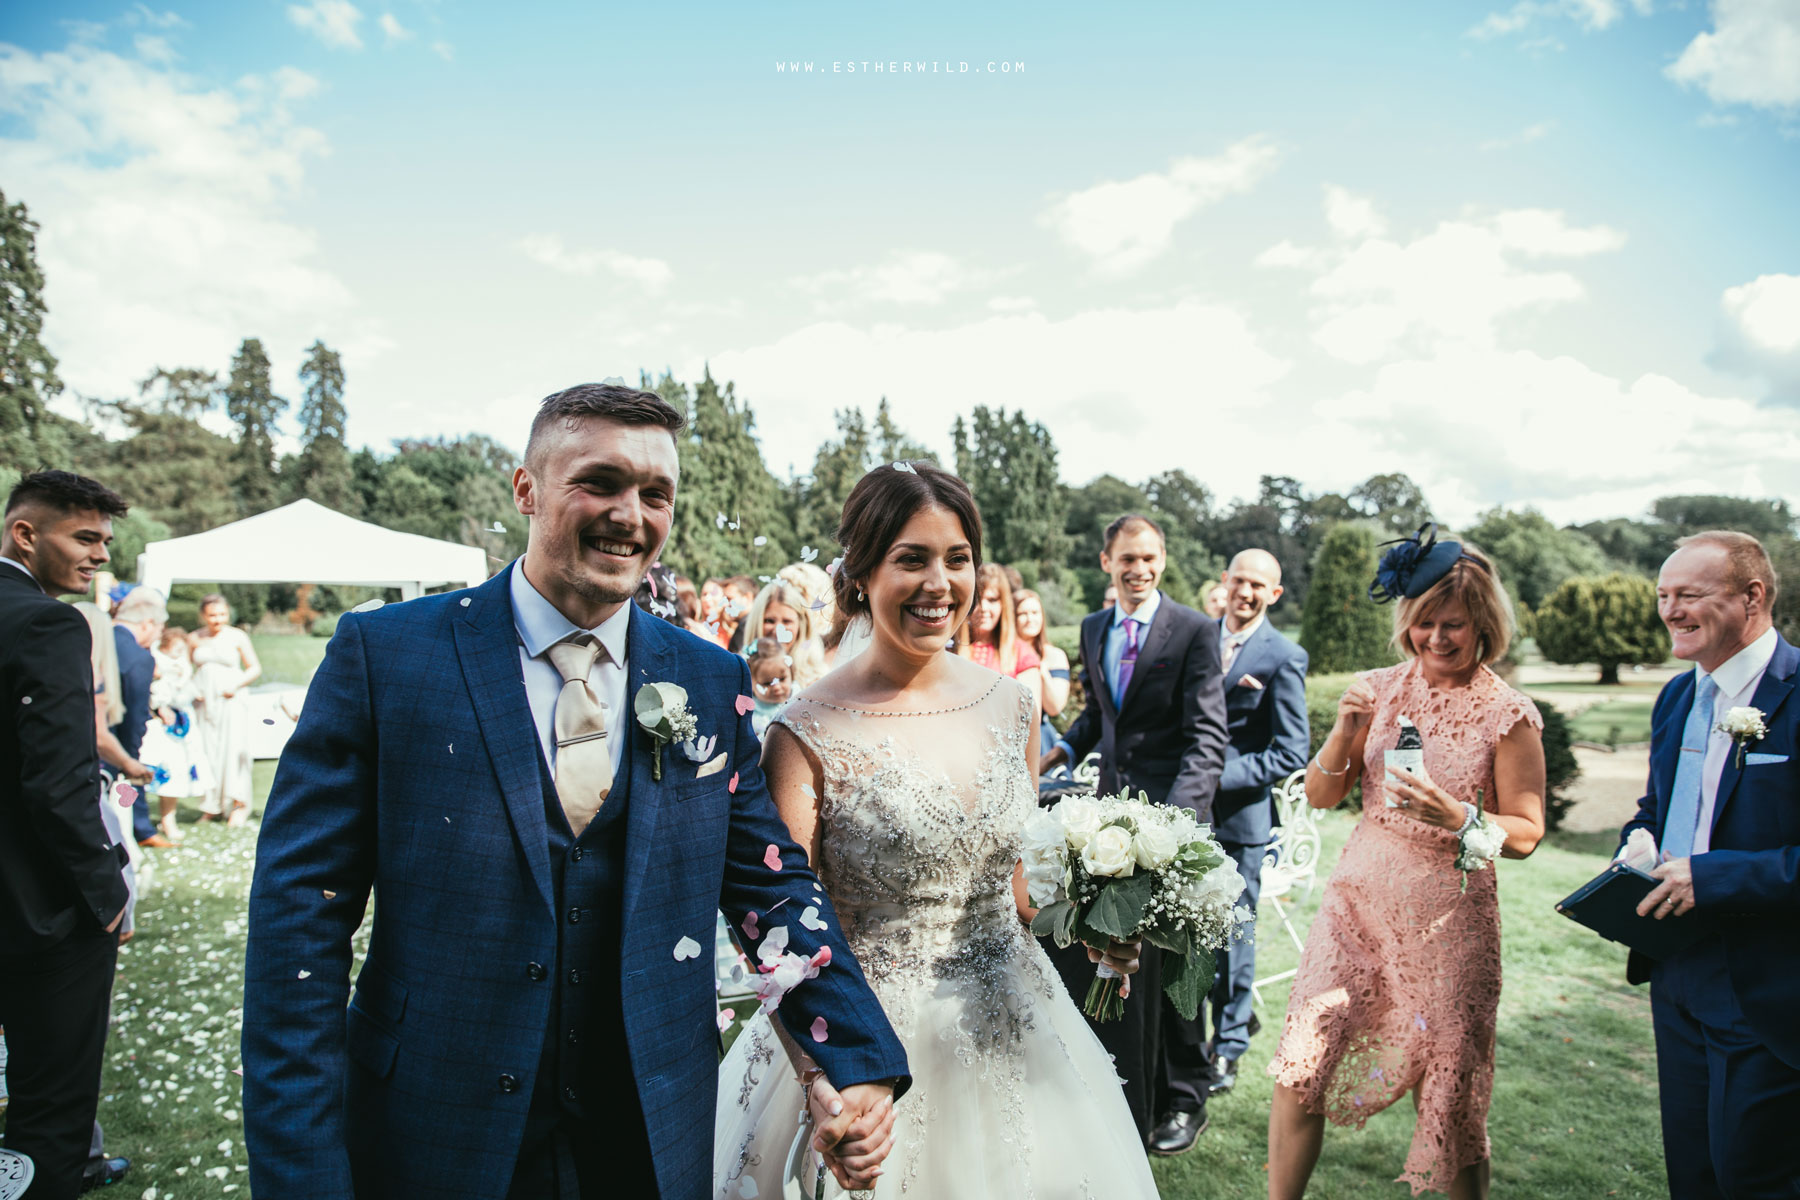 Lynford_Hall_Wedding_Thetford_Mundford_Esther_Wild_Photographer_IMG_1612.jpg